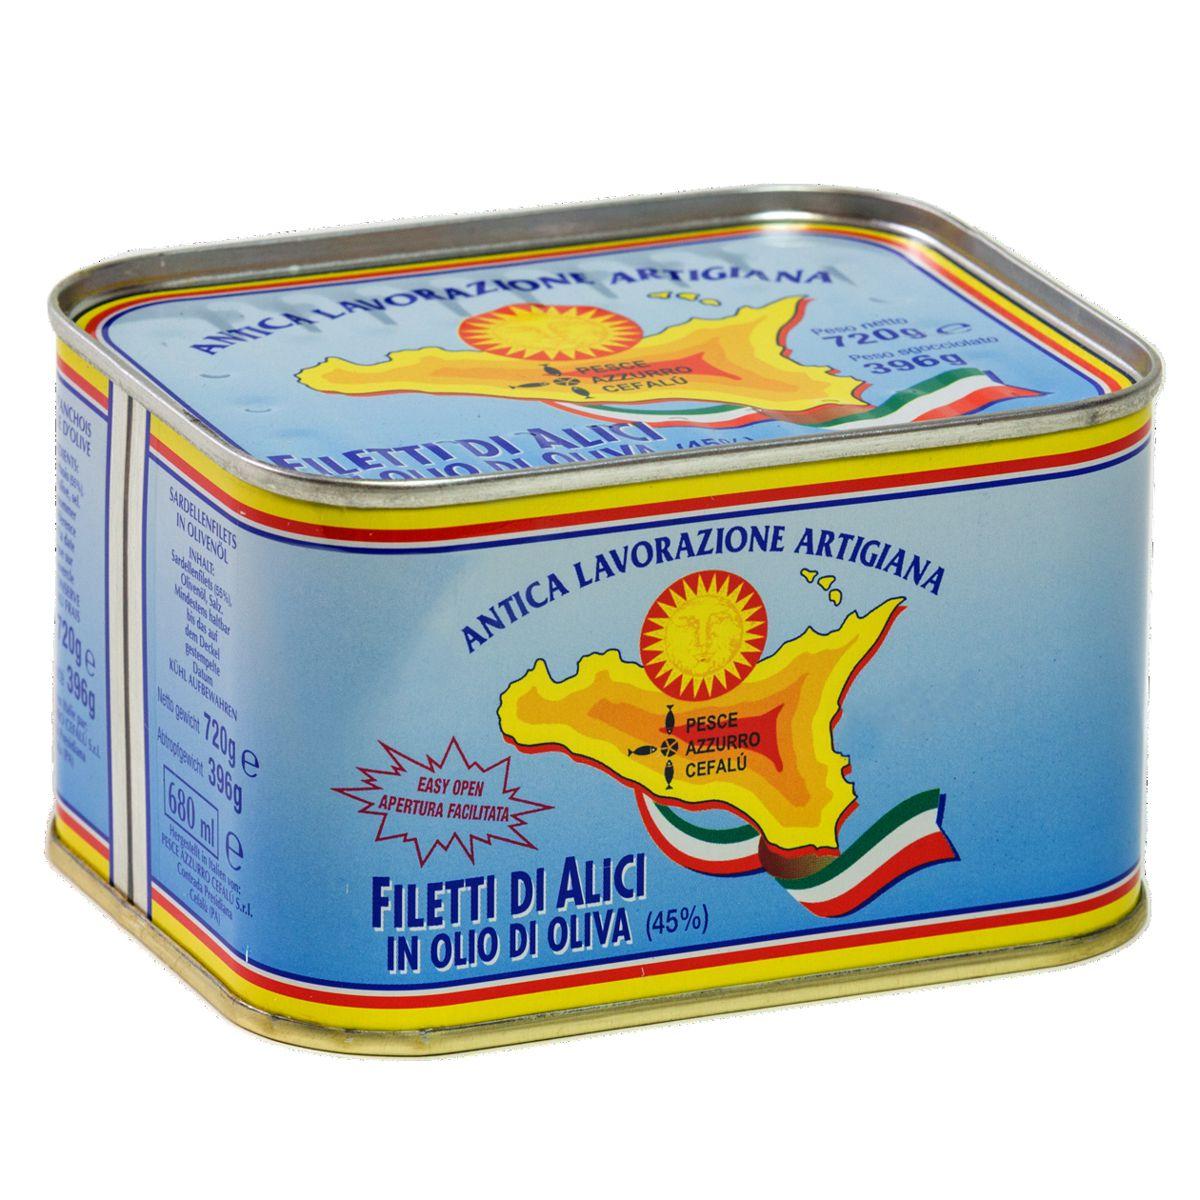 Filetes De Anchoa En Aceite De Oliva - Lata Pesce Azzurro